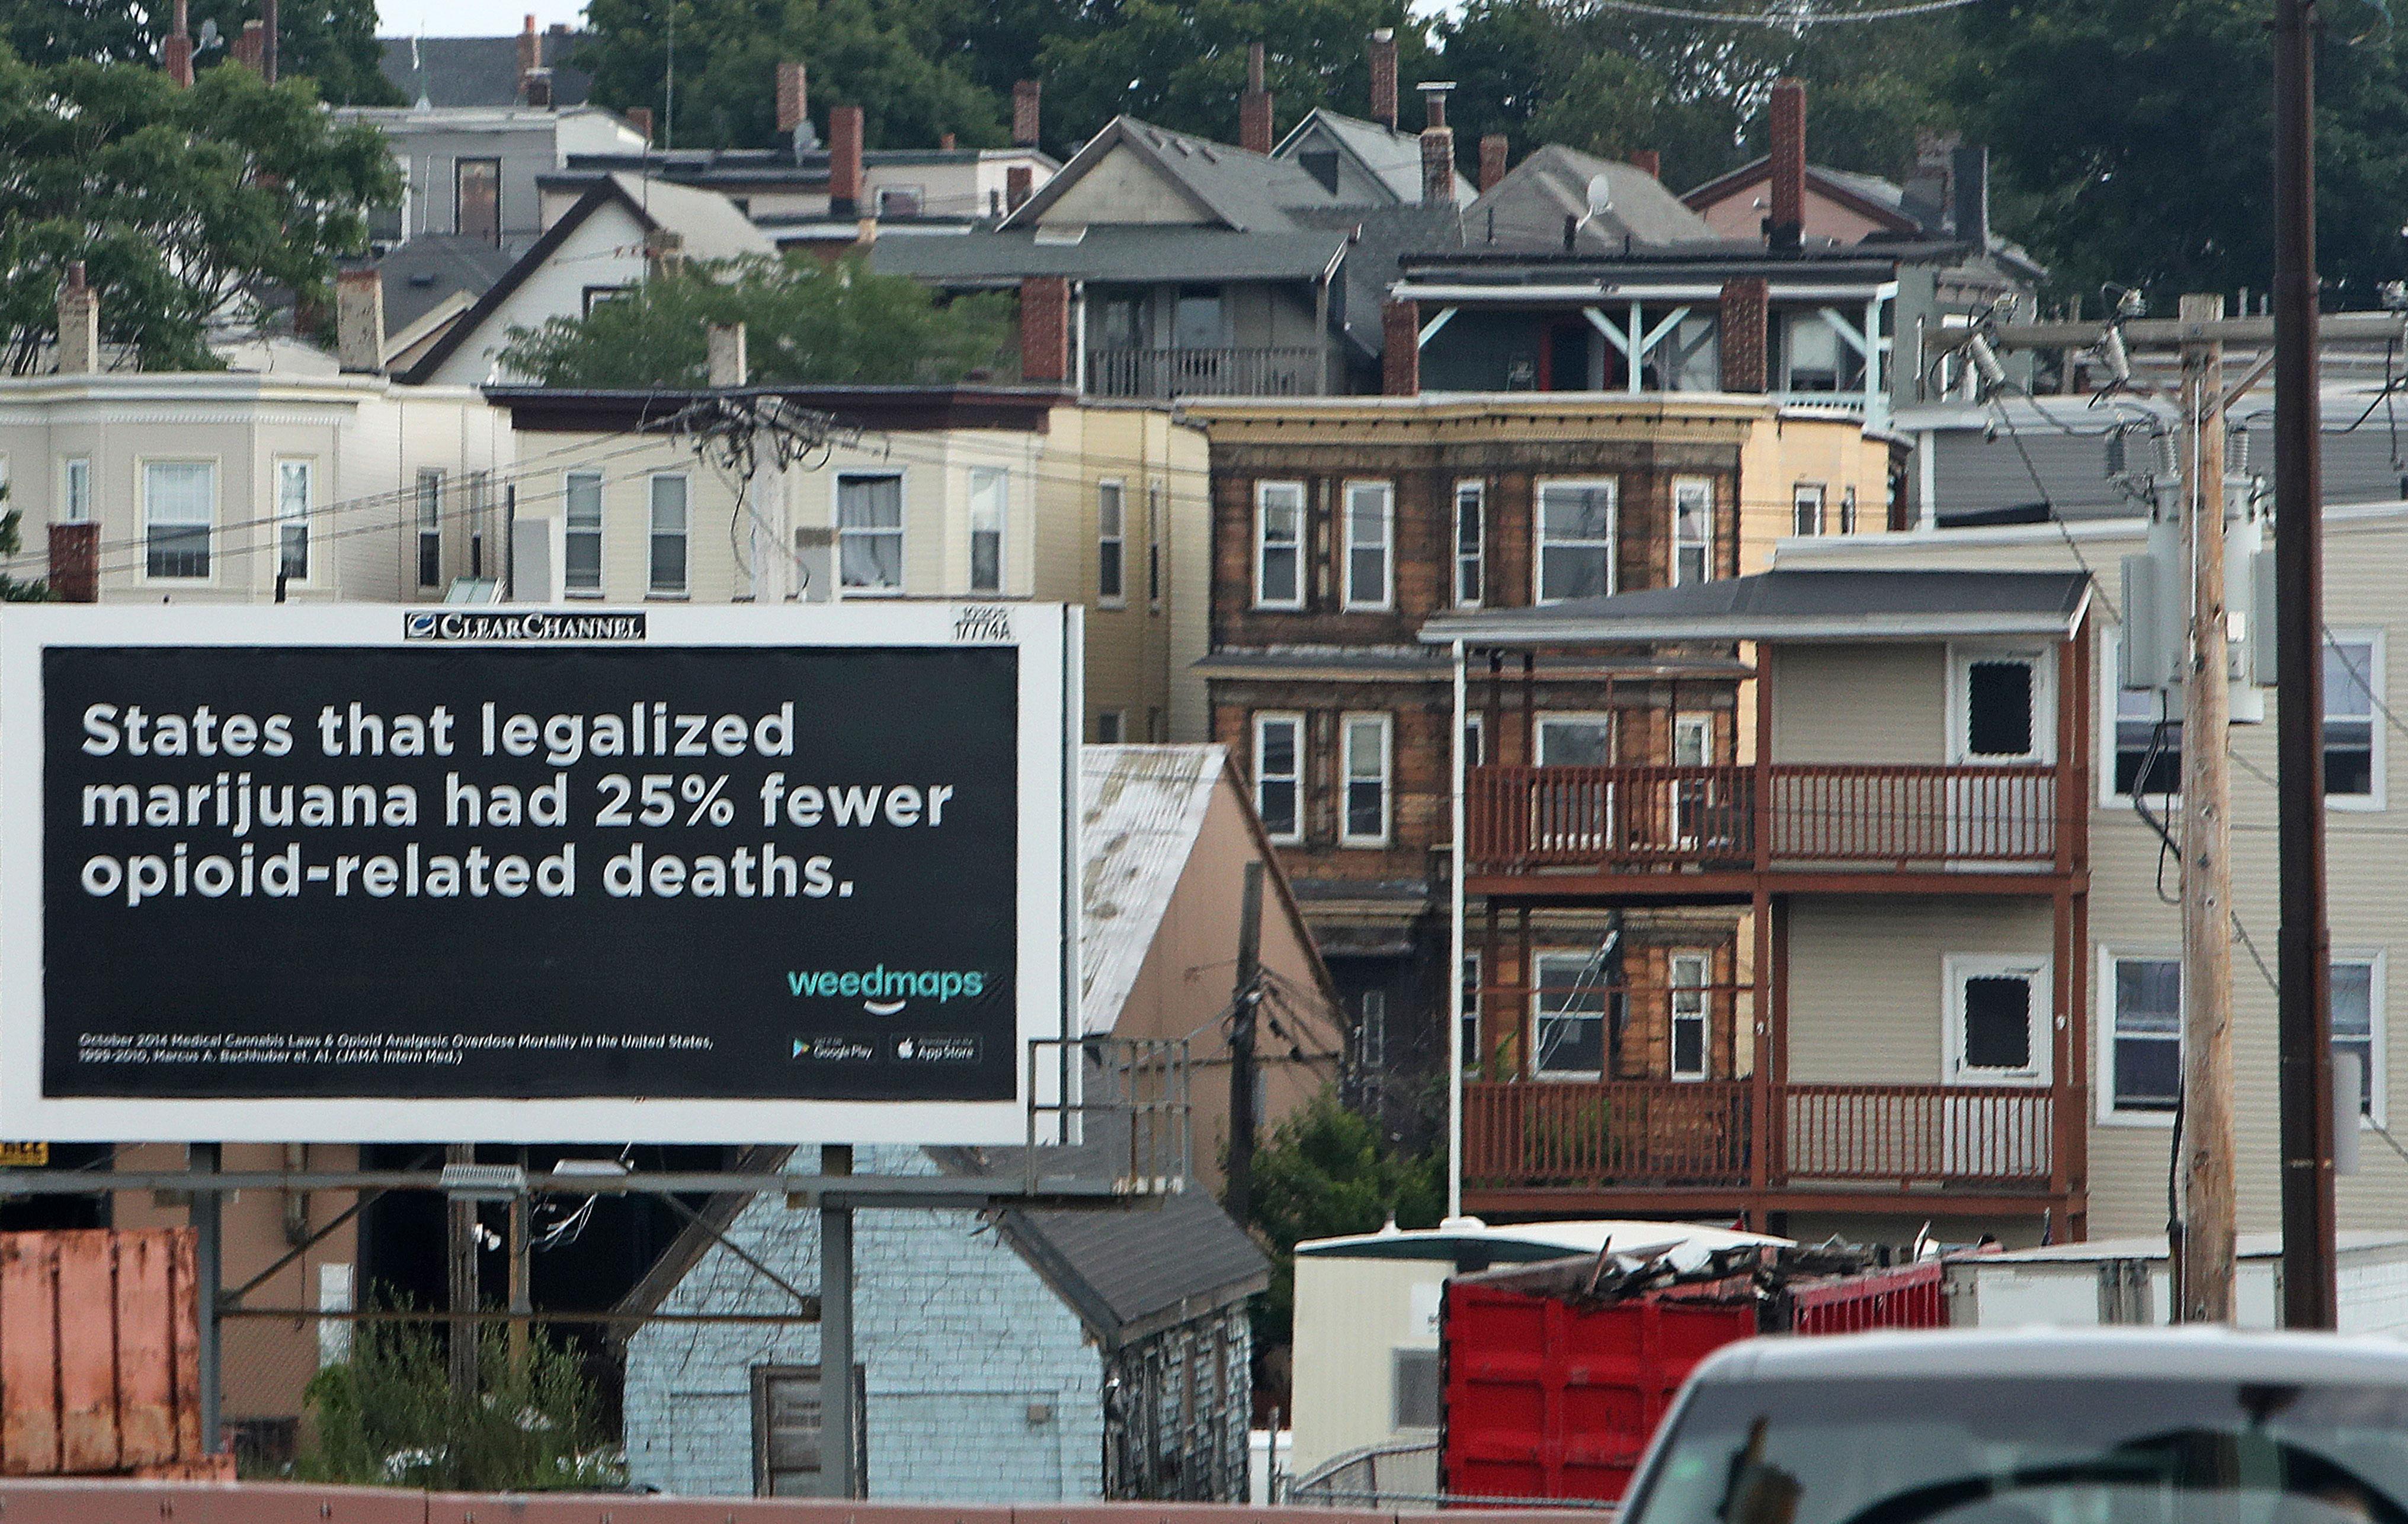 Marijuana billboard in South Boston called 'insensitive' - The